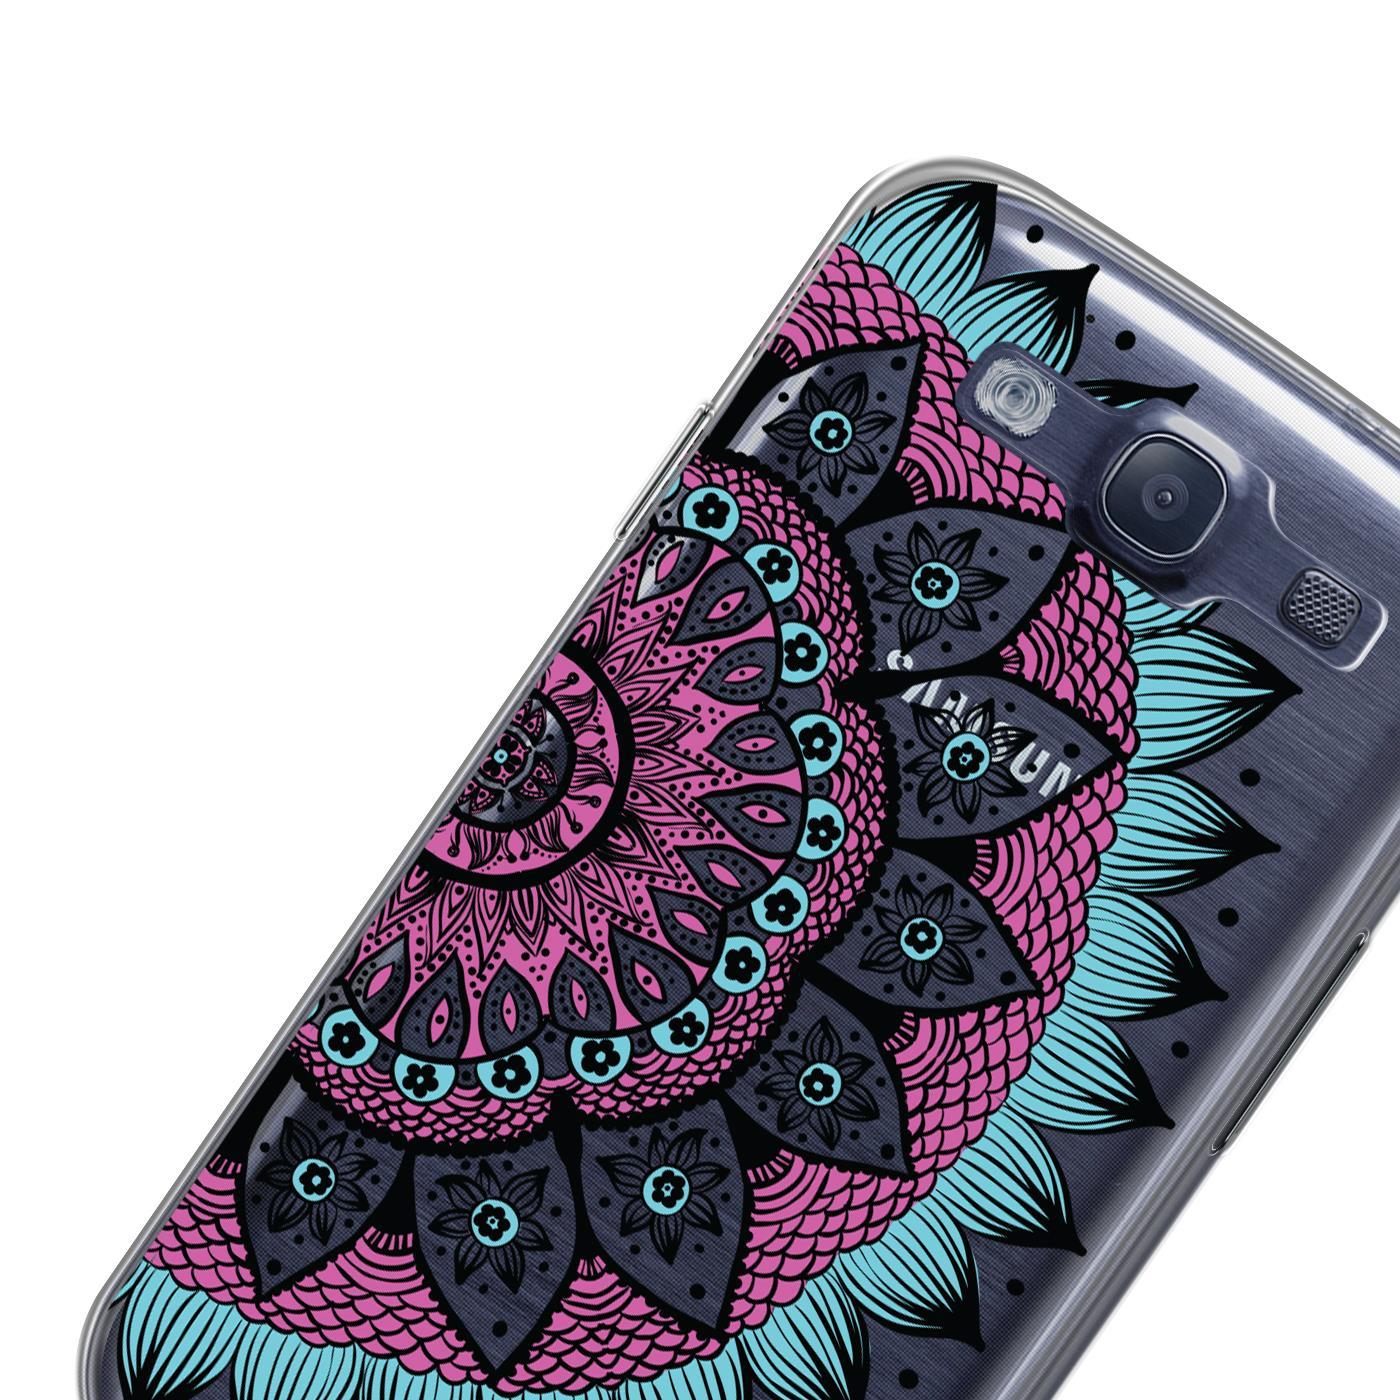 Samsung-Galaxy-S3-Neo-Handy-Schutz-Huelle-Case-TPU-Silikon-Cover-Tasche-Mandala Indexbild 15